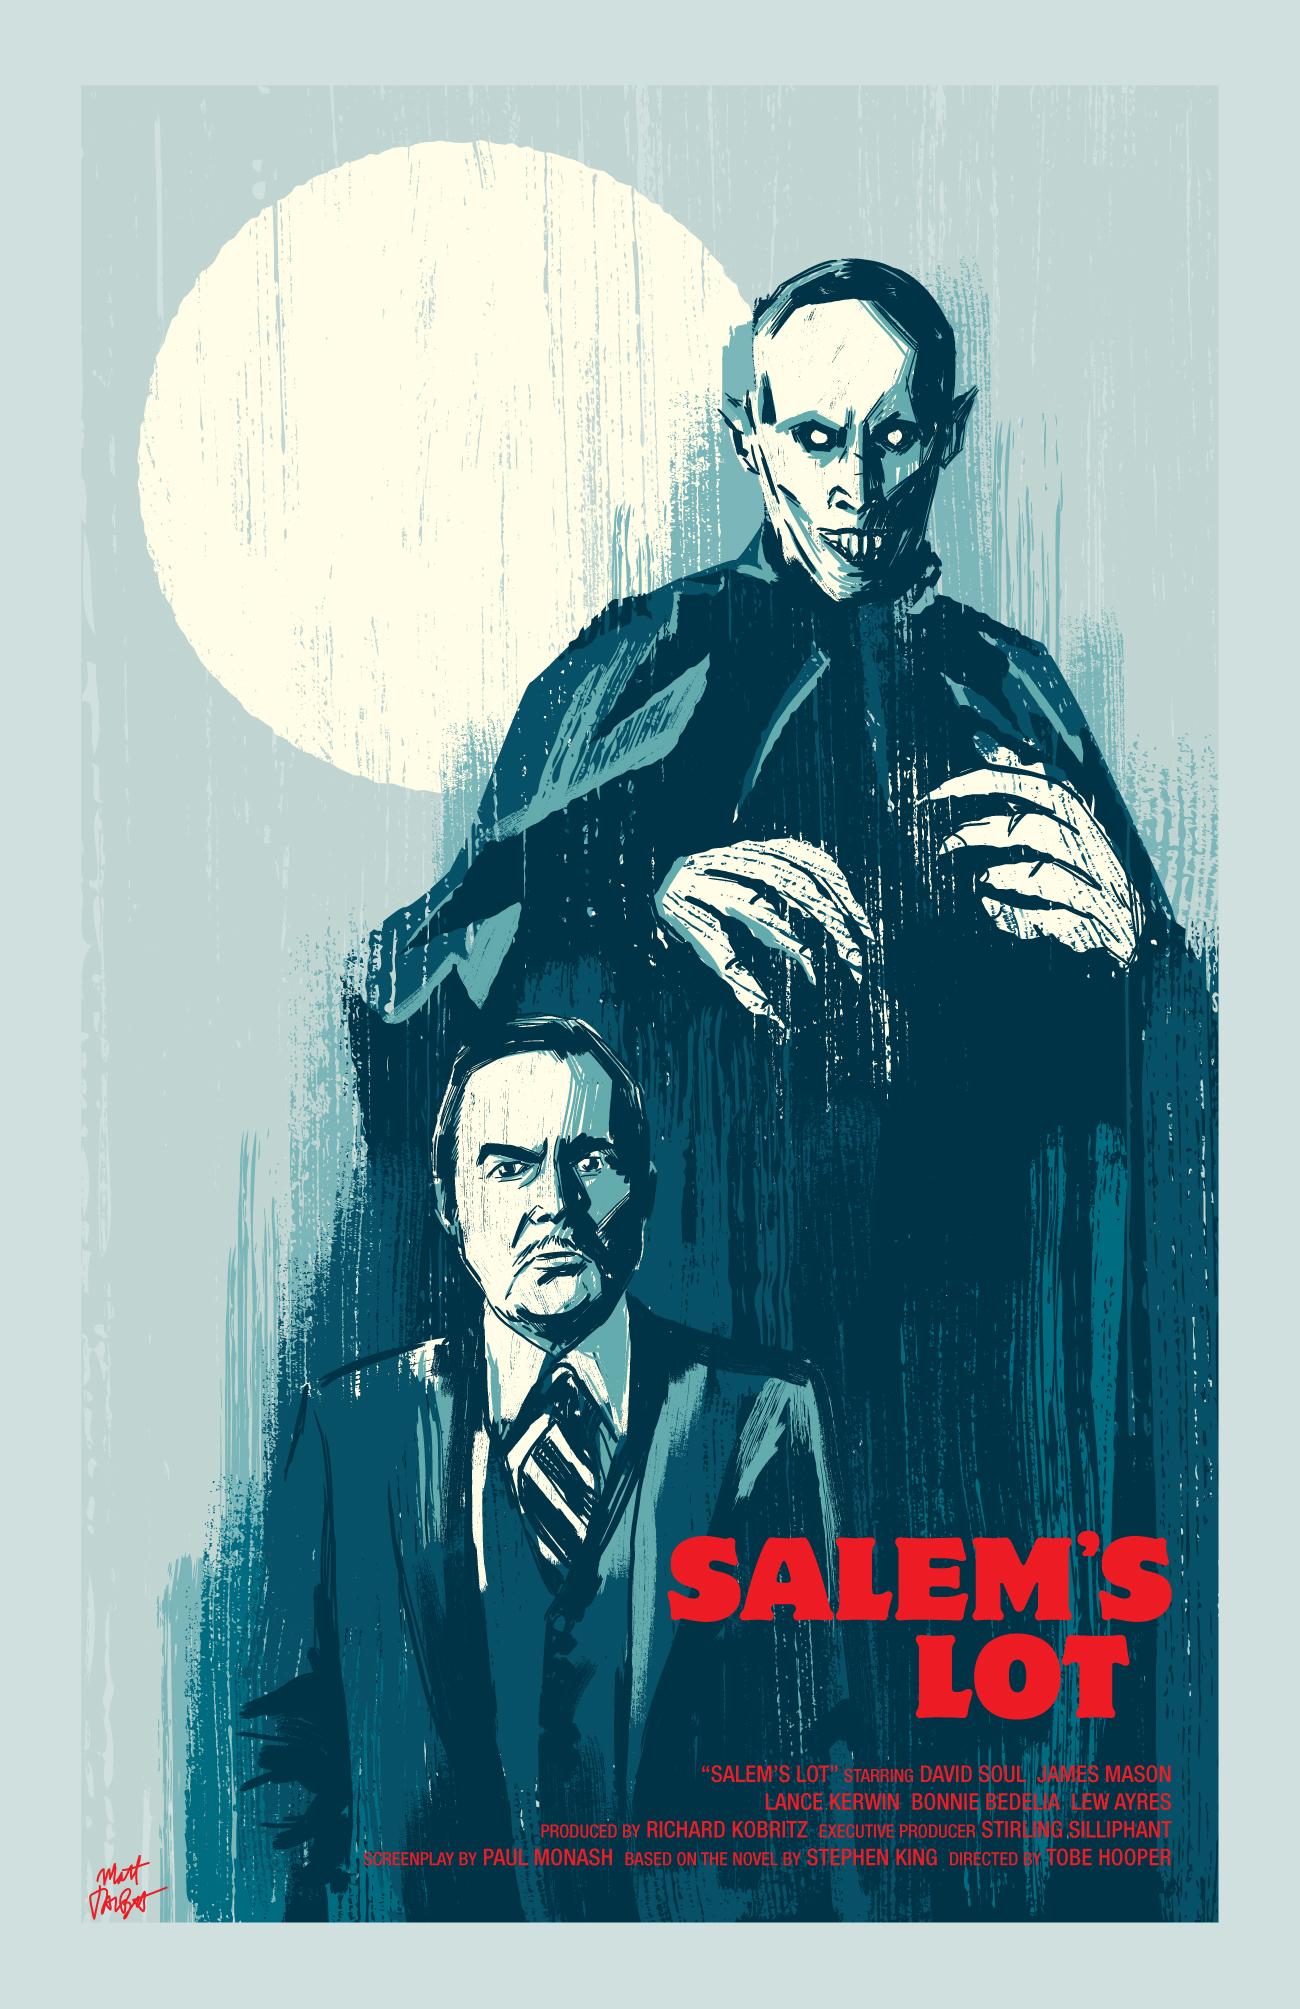 Salem's Lot poster by Matt Talbot